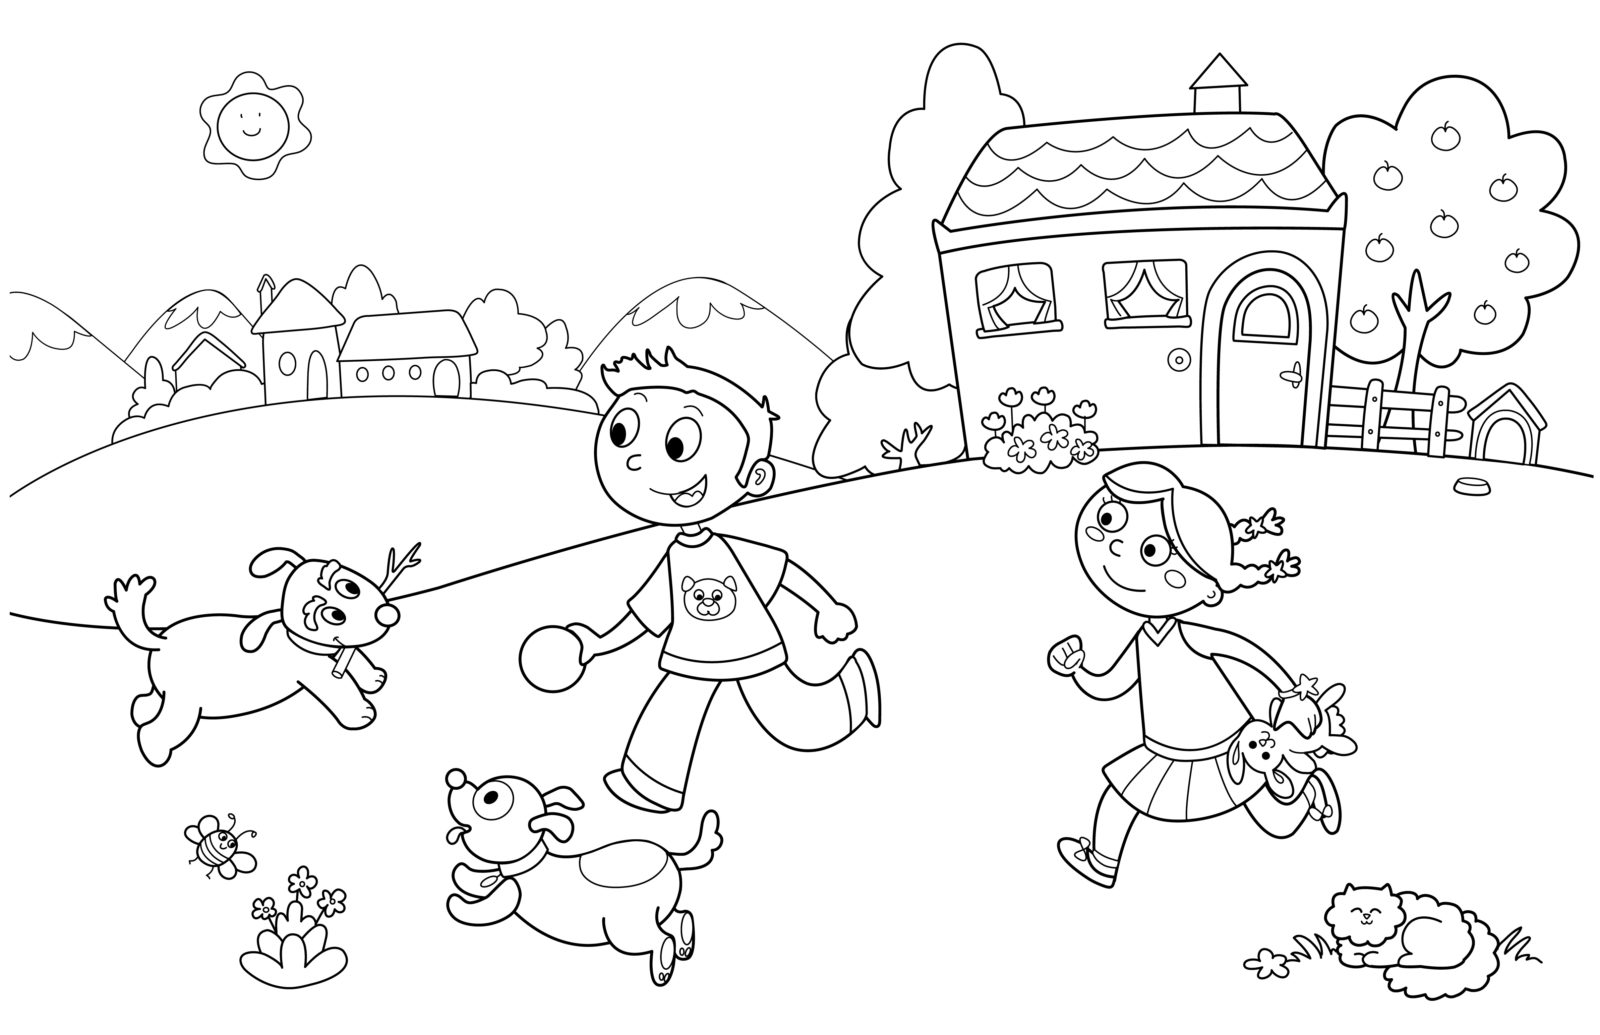 Раскраска дети во дворе летом бегают